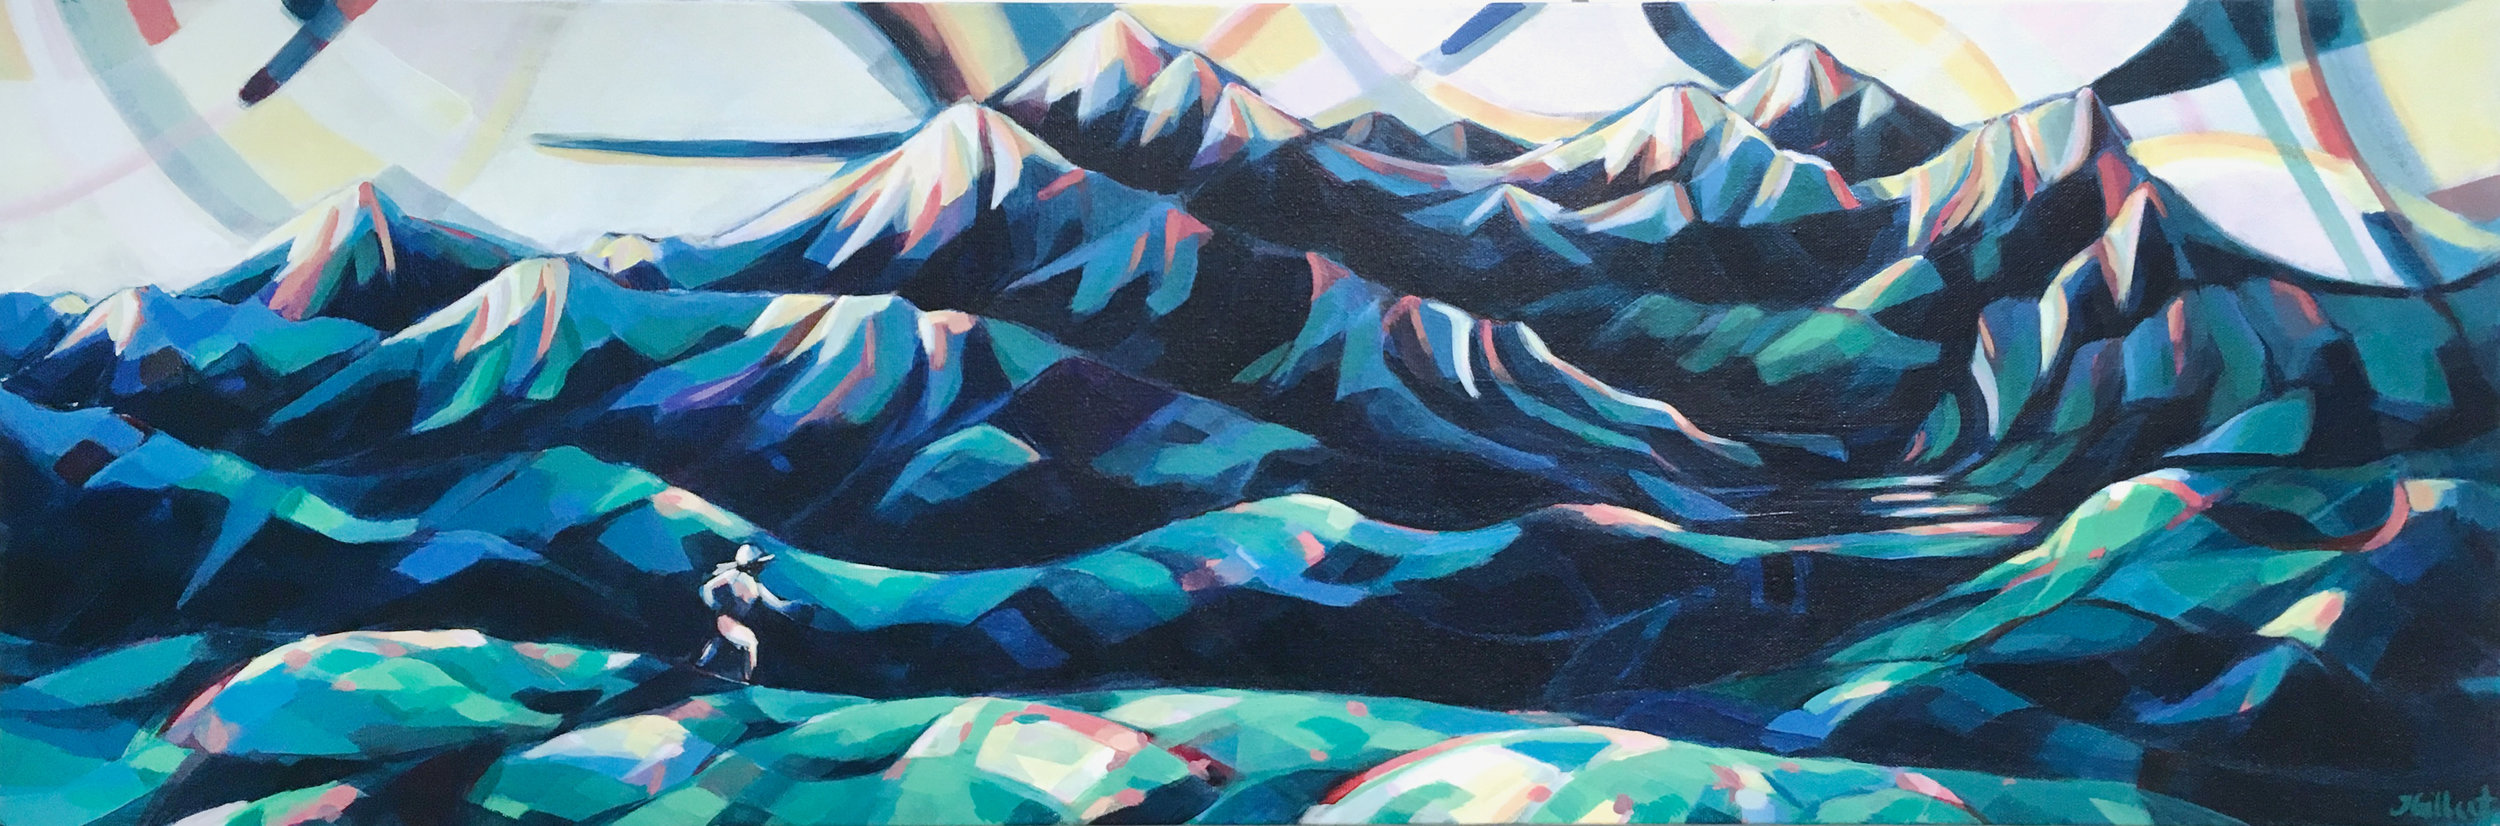 AlpineAspirations_AcrylicCanvas-12x36.jpg